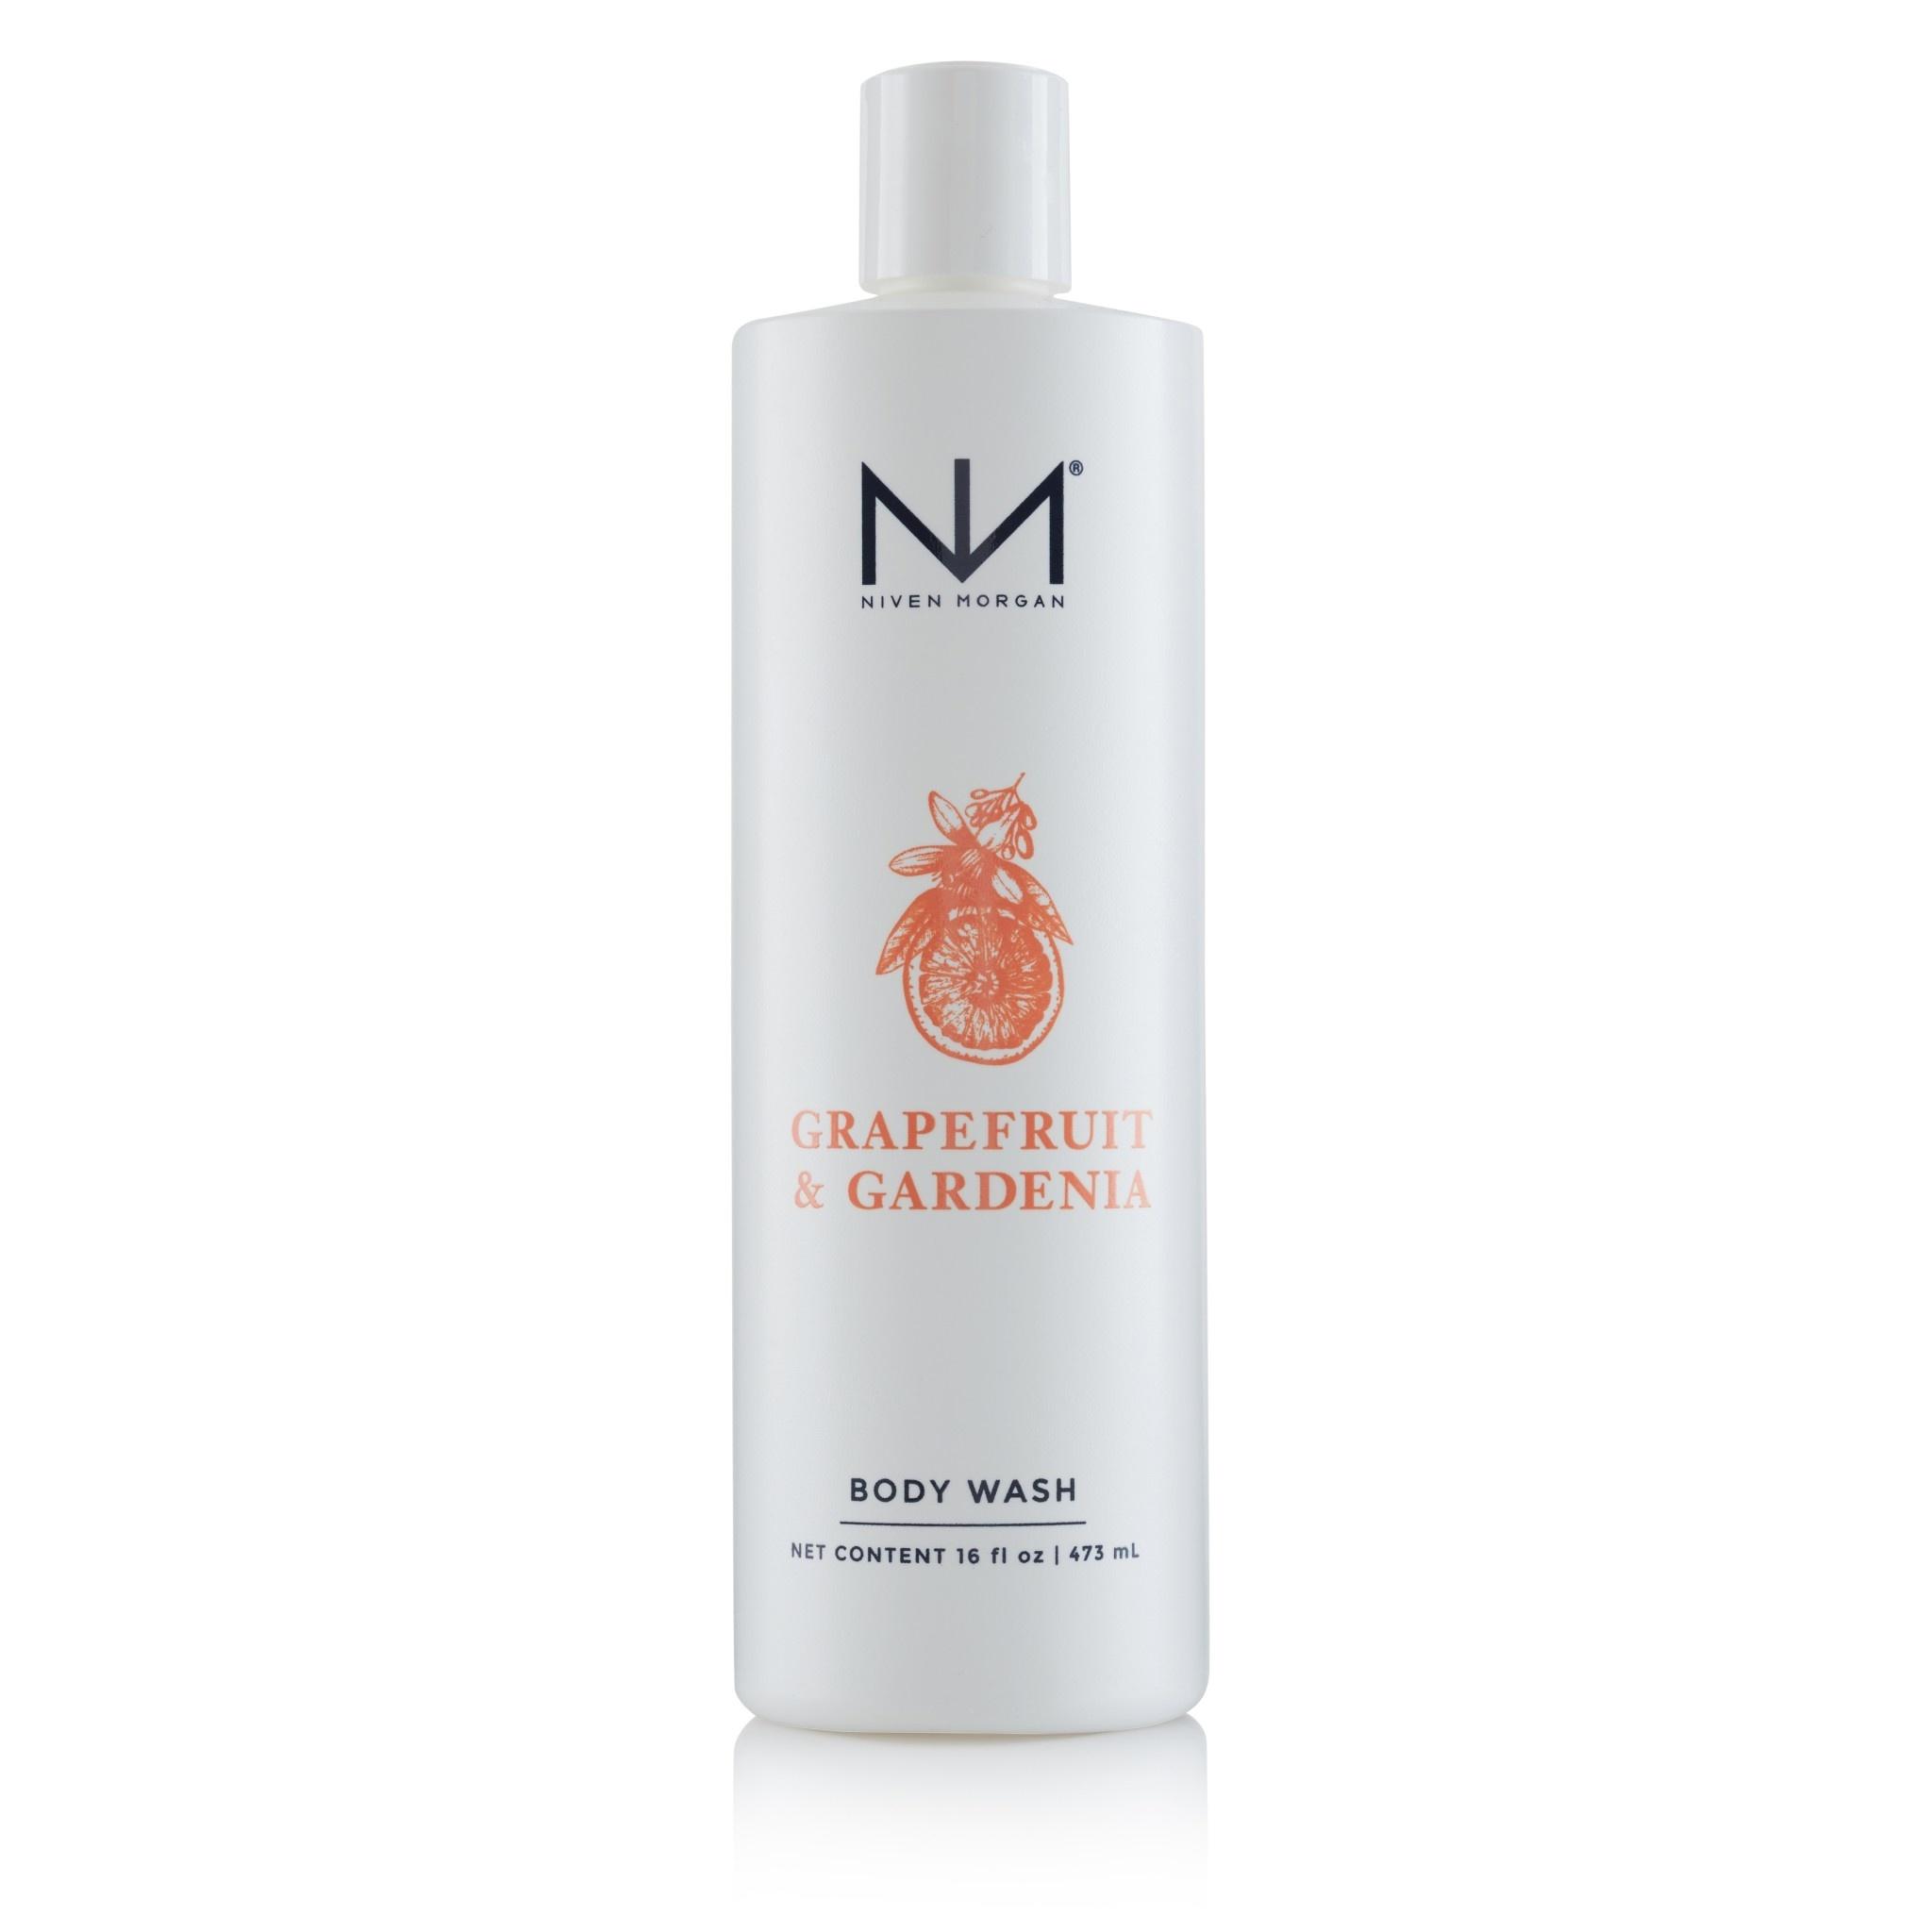 Niven Morgan Grapefruit & Gardenia Body Wash 16oz